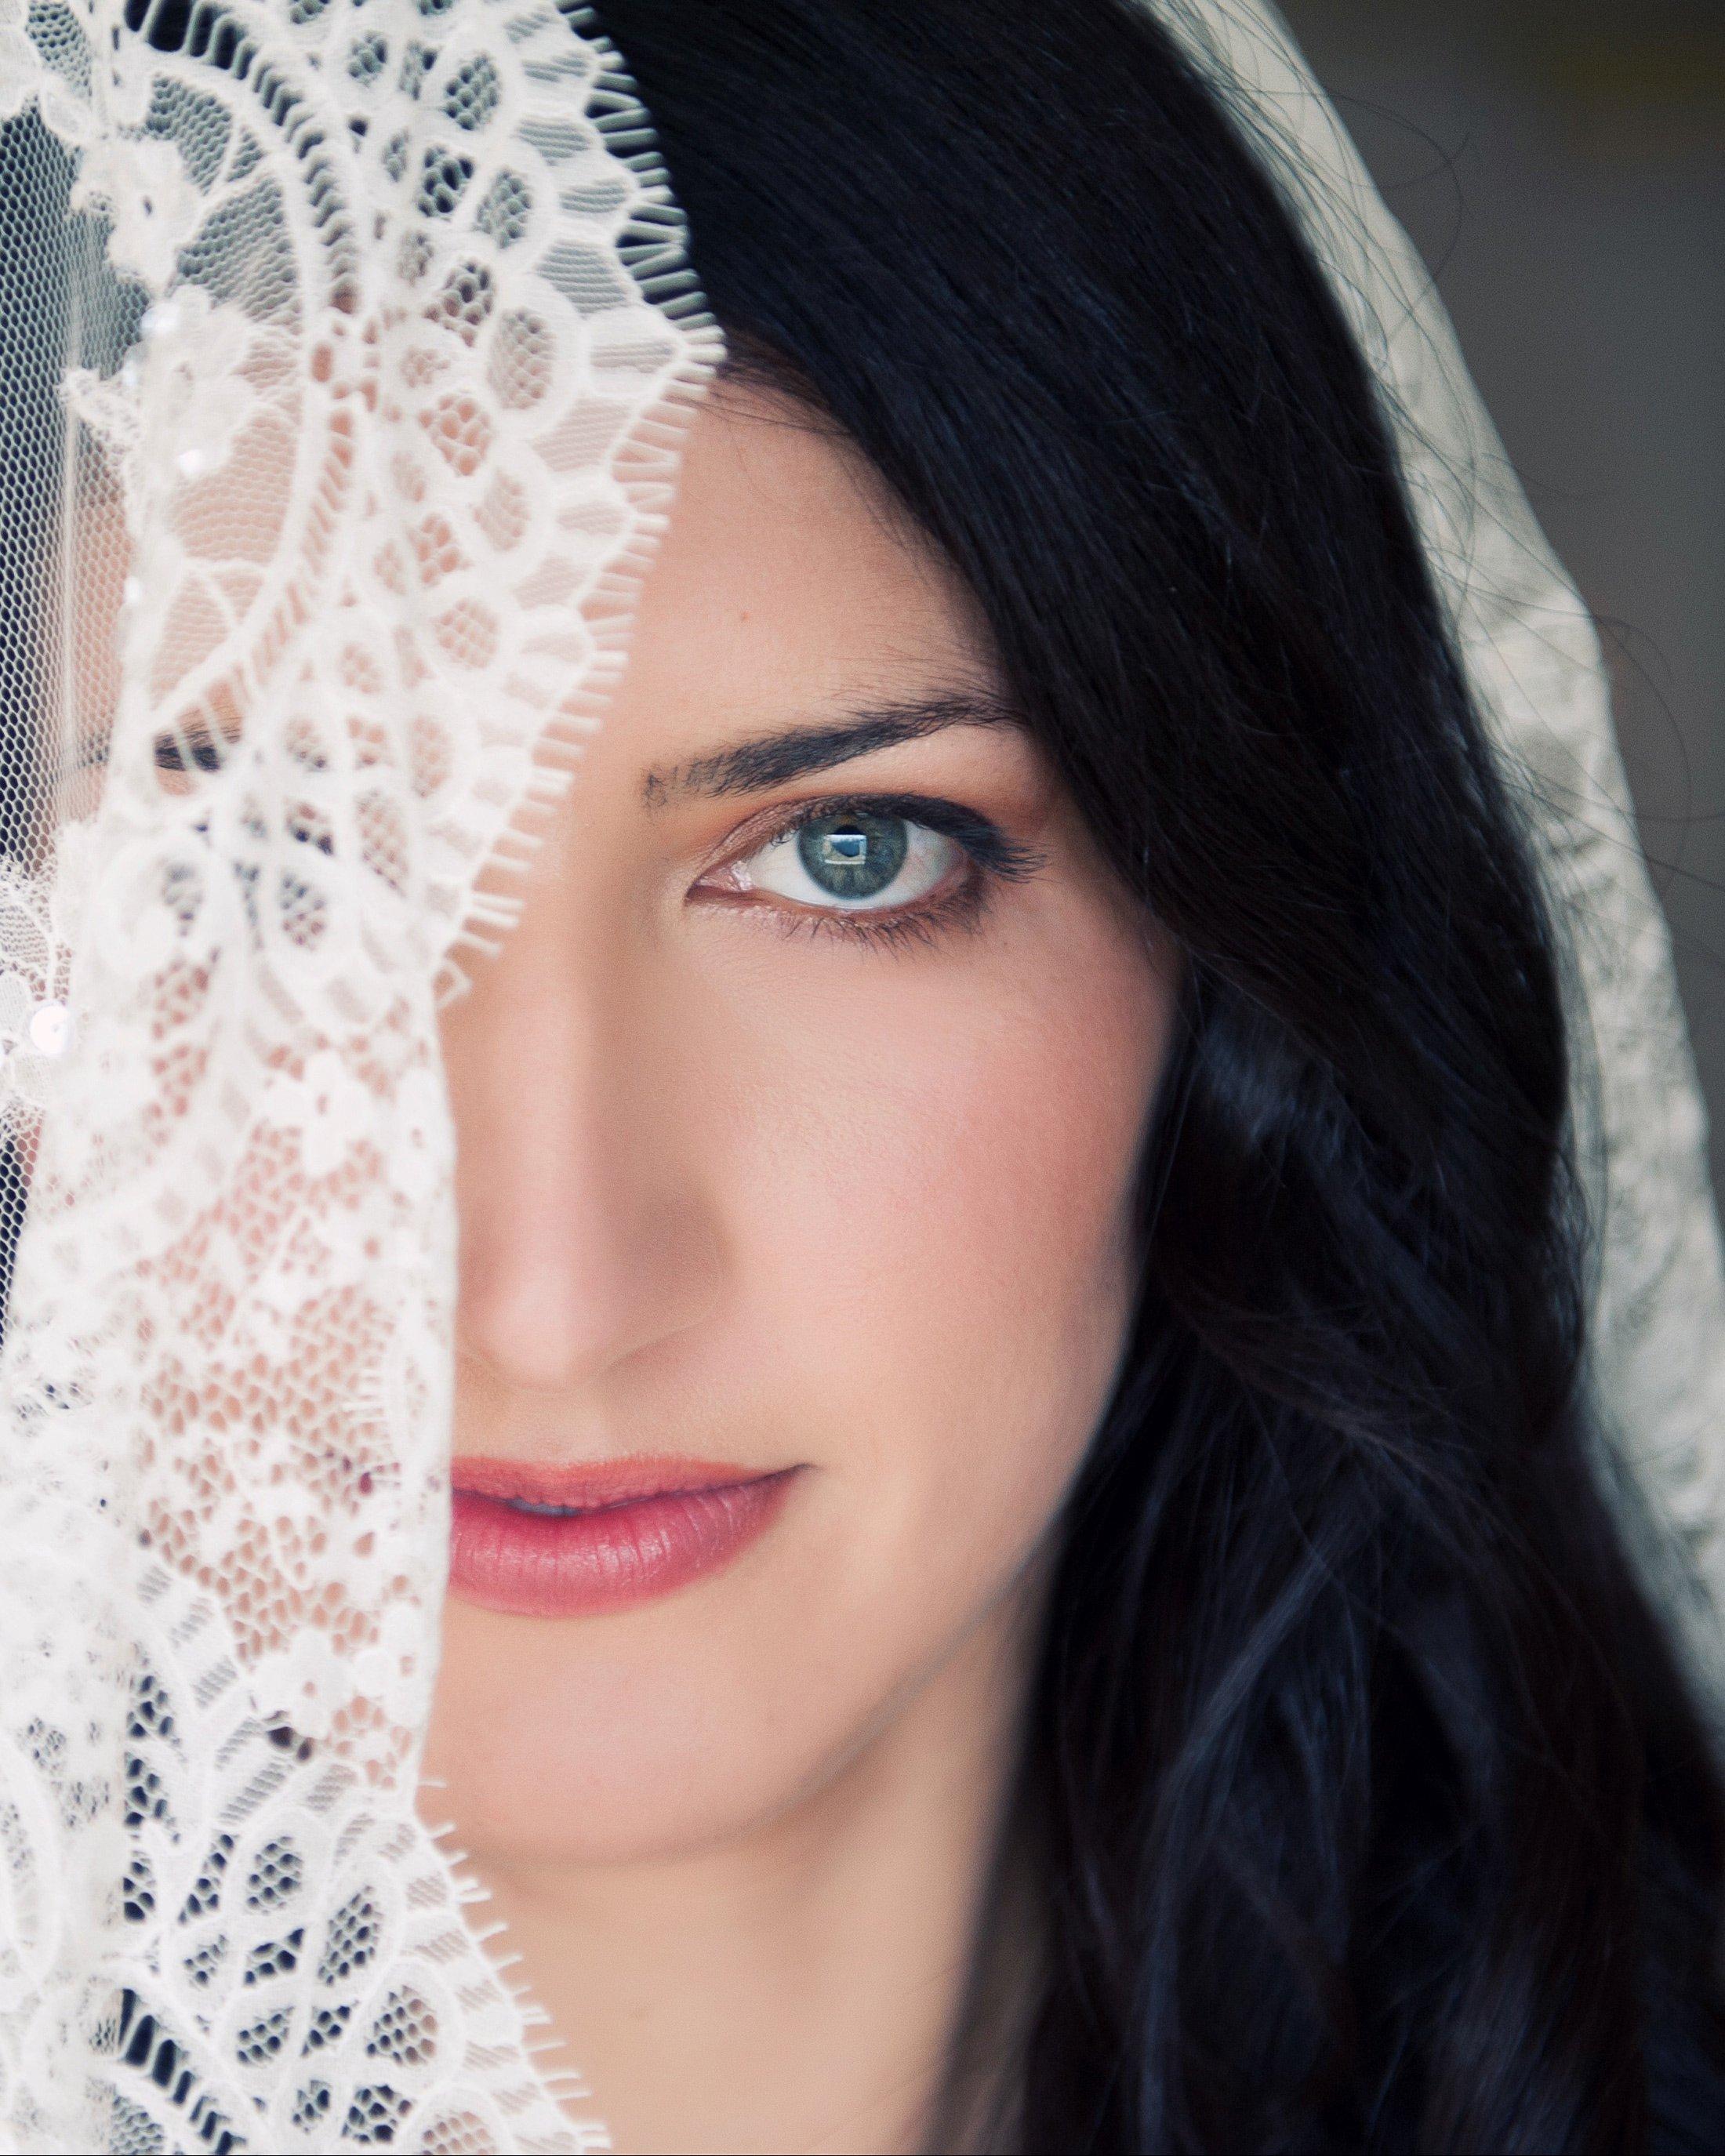 008-best-close-up-bride